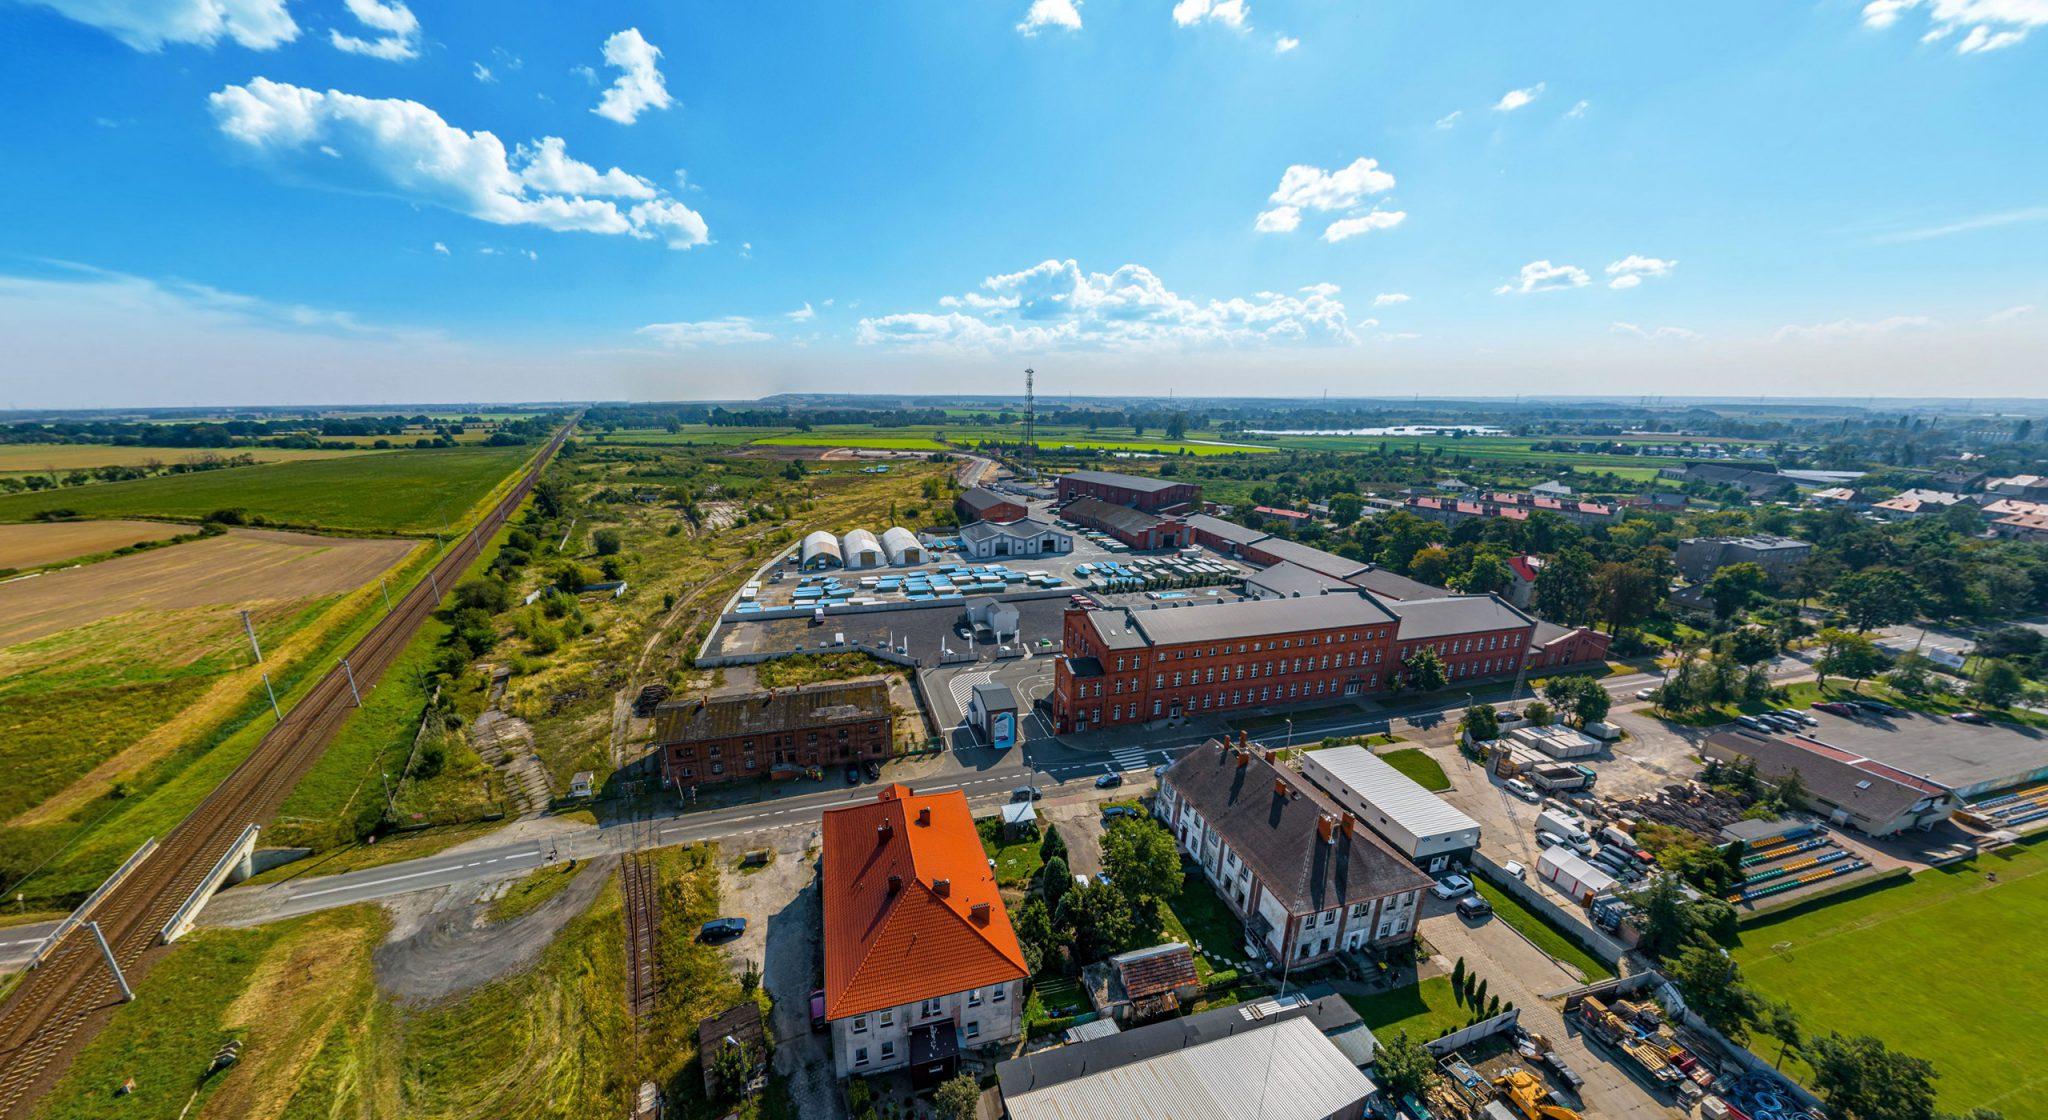 poolsfactory-producent-basenow-lewin-brzeski